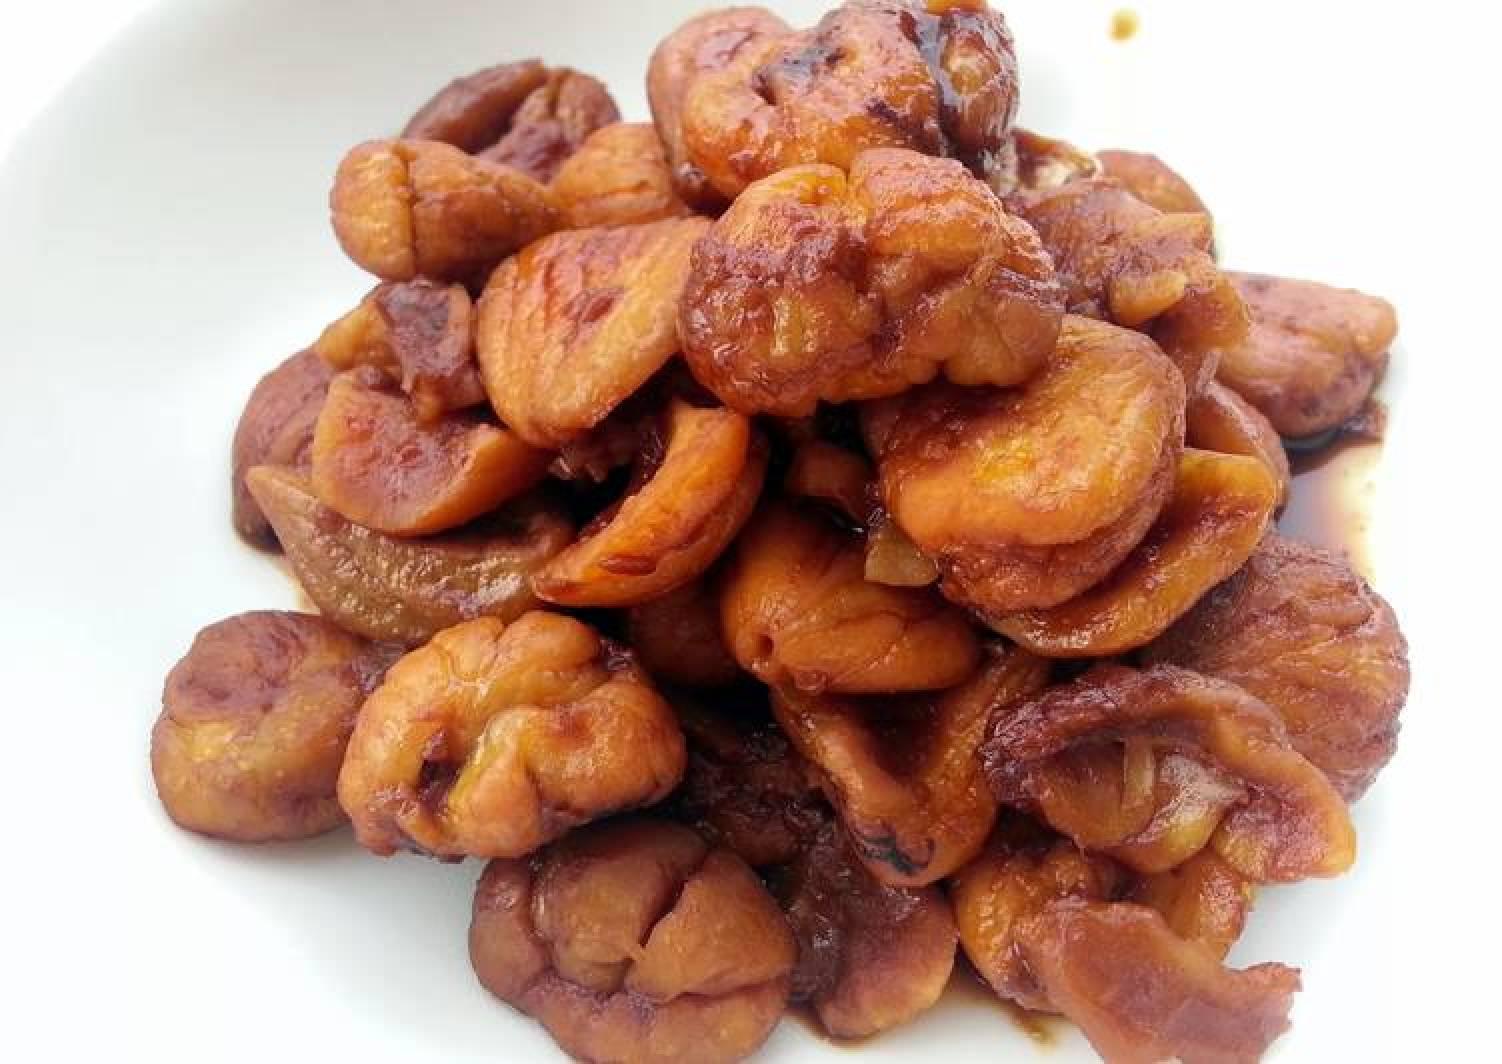 Caramelized Chestnut Appetizer